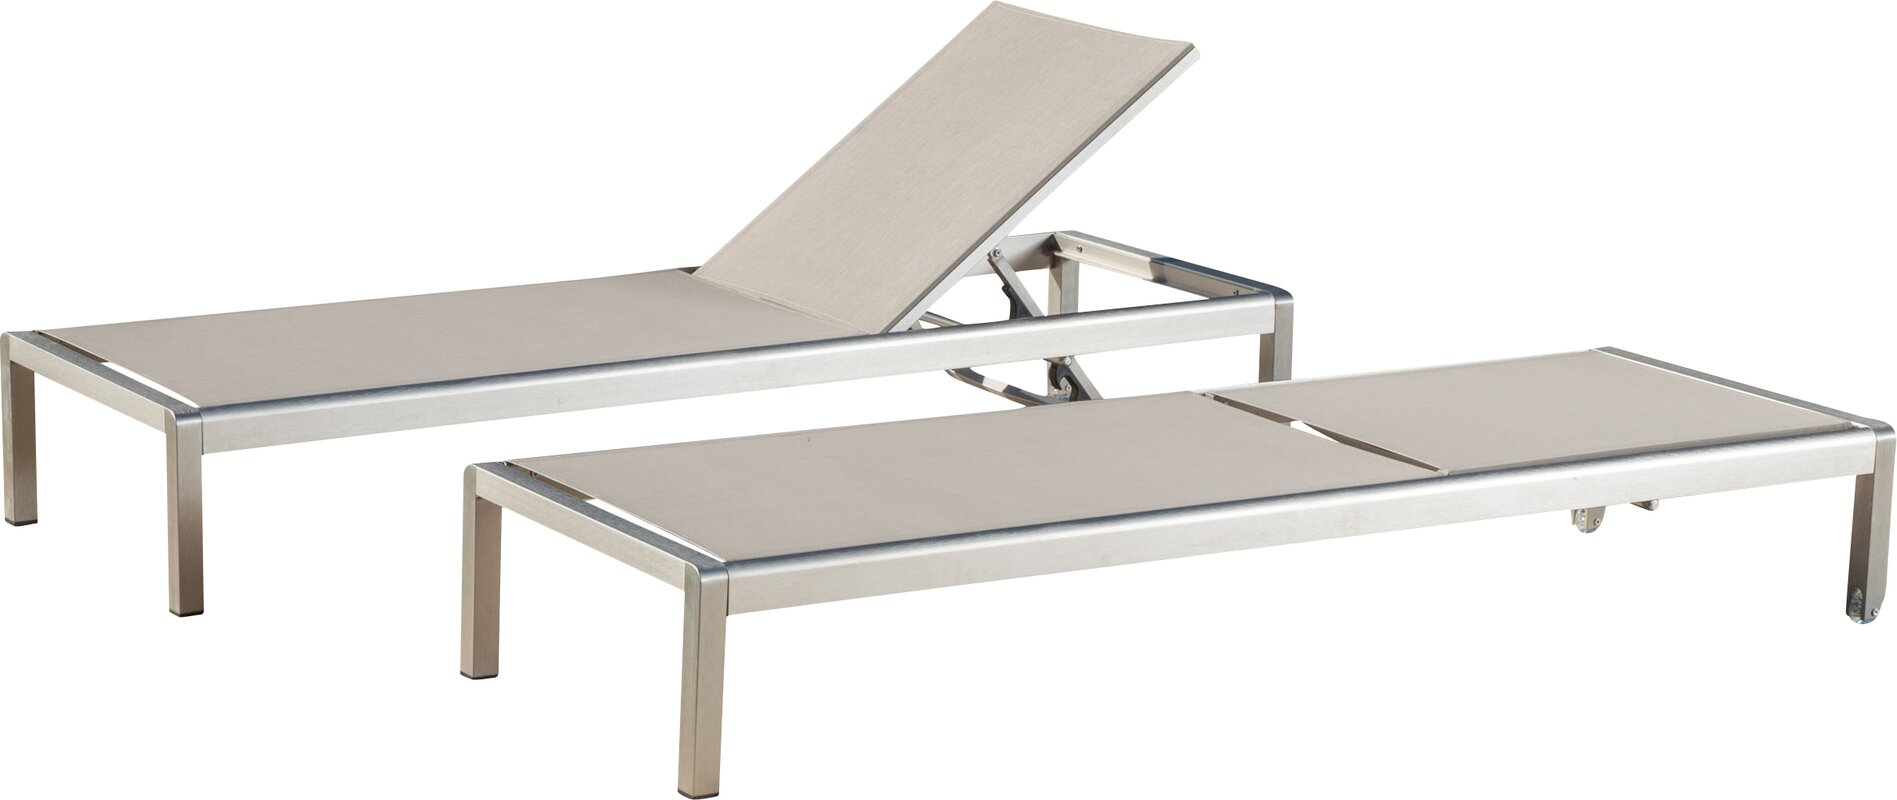 cavallet chaise stardust modern gandia escavallet blasco es double chair lounger lounge outdoor